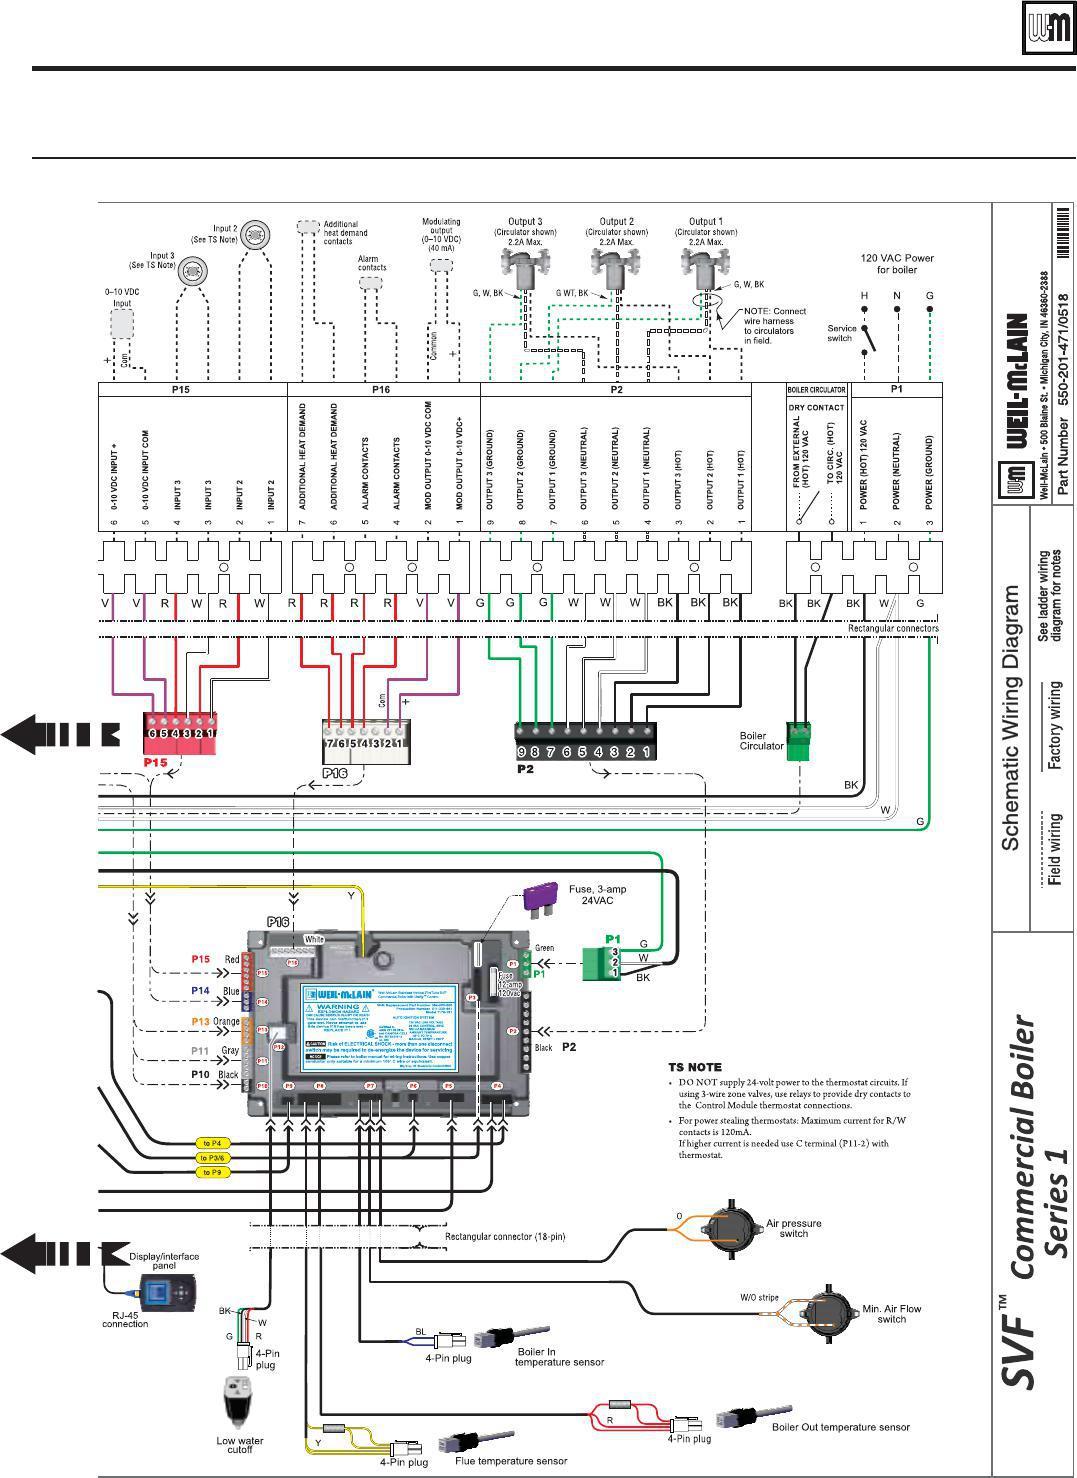 Weil Mclain Steam Boiler Wiring Diagram